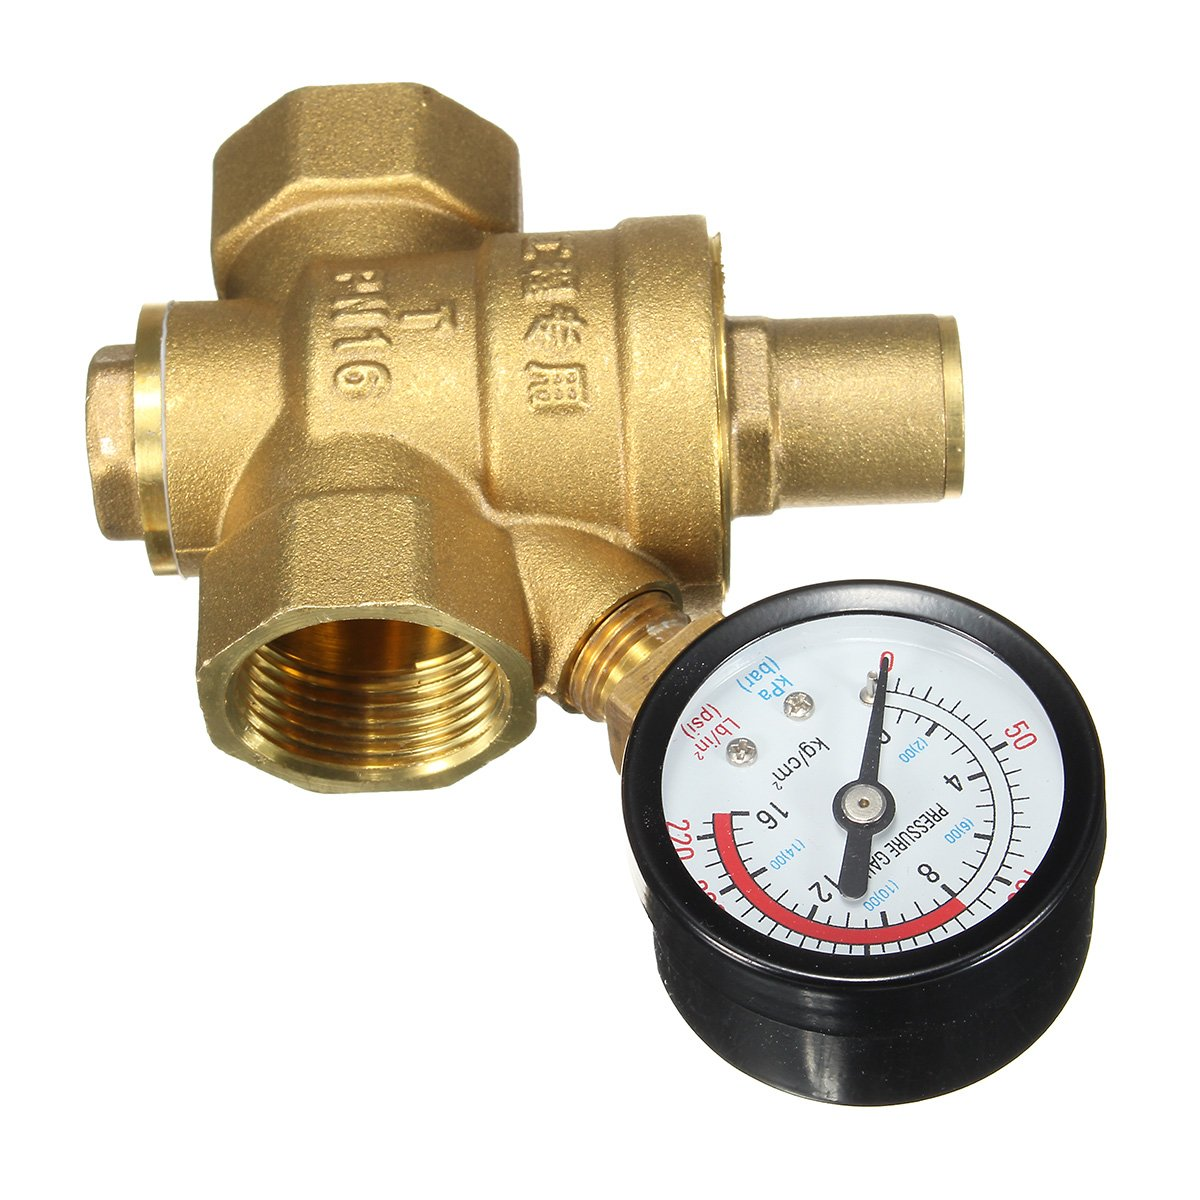 DN20 NPT 3/4 Adjustable Brass Water Pressure Regulator Reducer with Gauge Meter Thailand